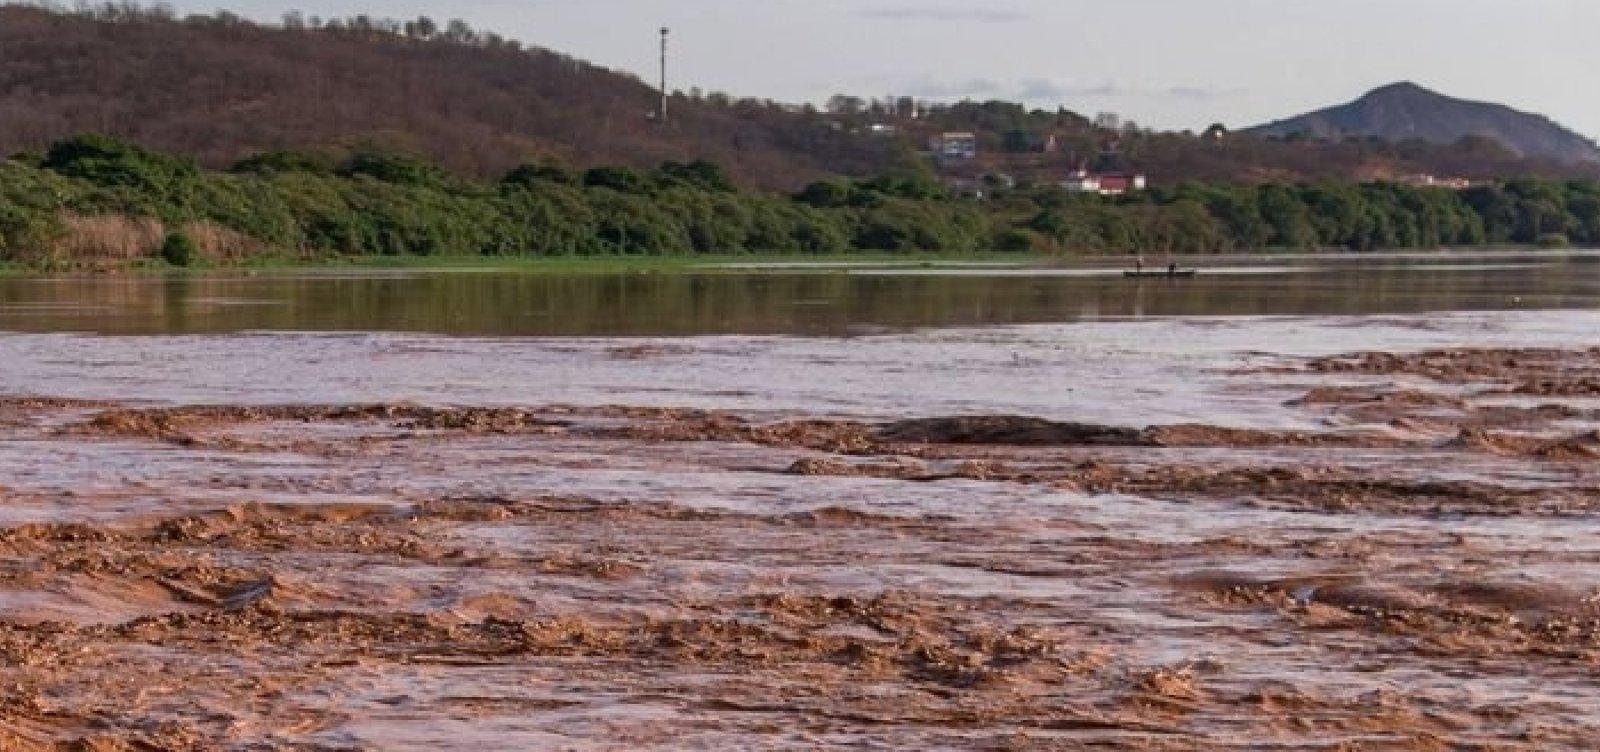 [Análise da Anvisa sobre consumo de peixes do Rio Doce causa divergências]